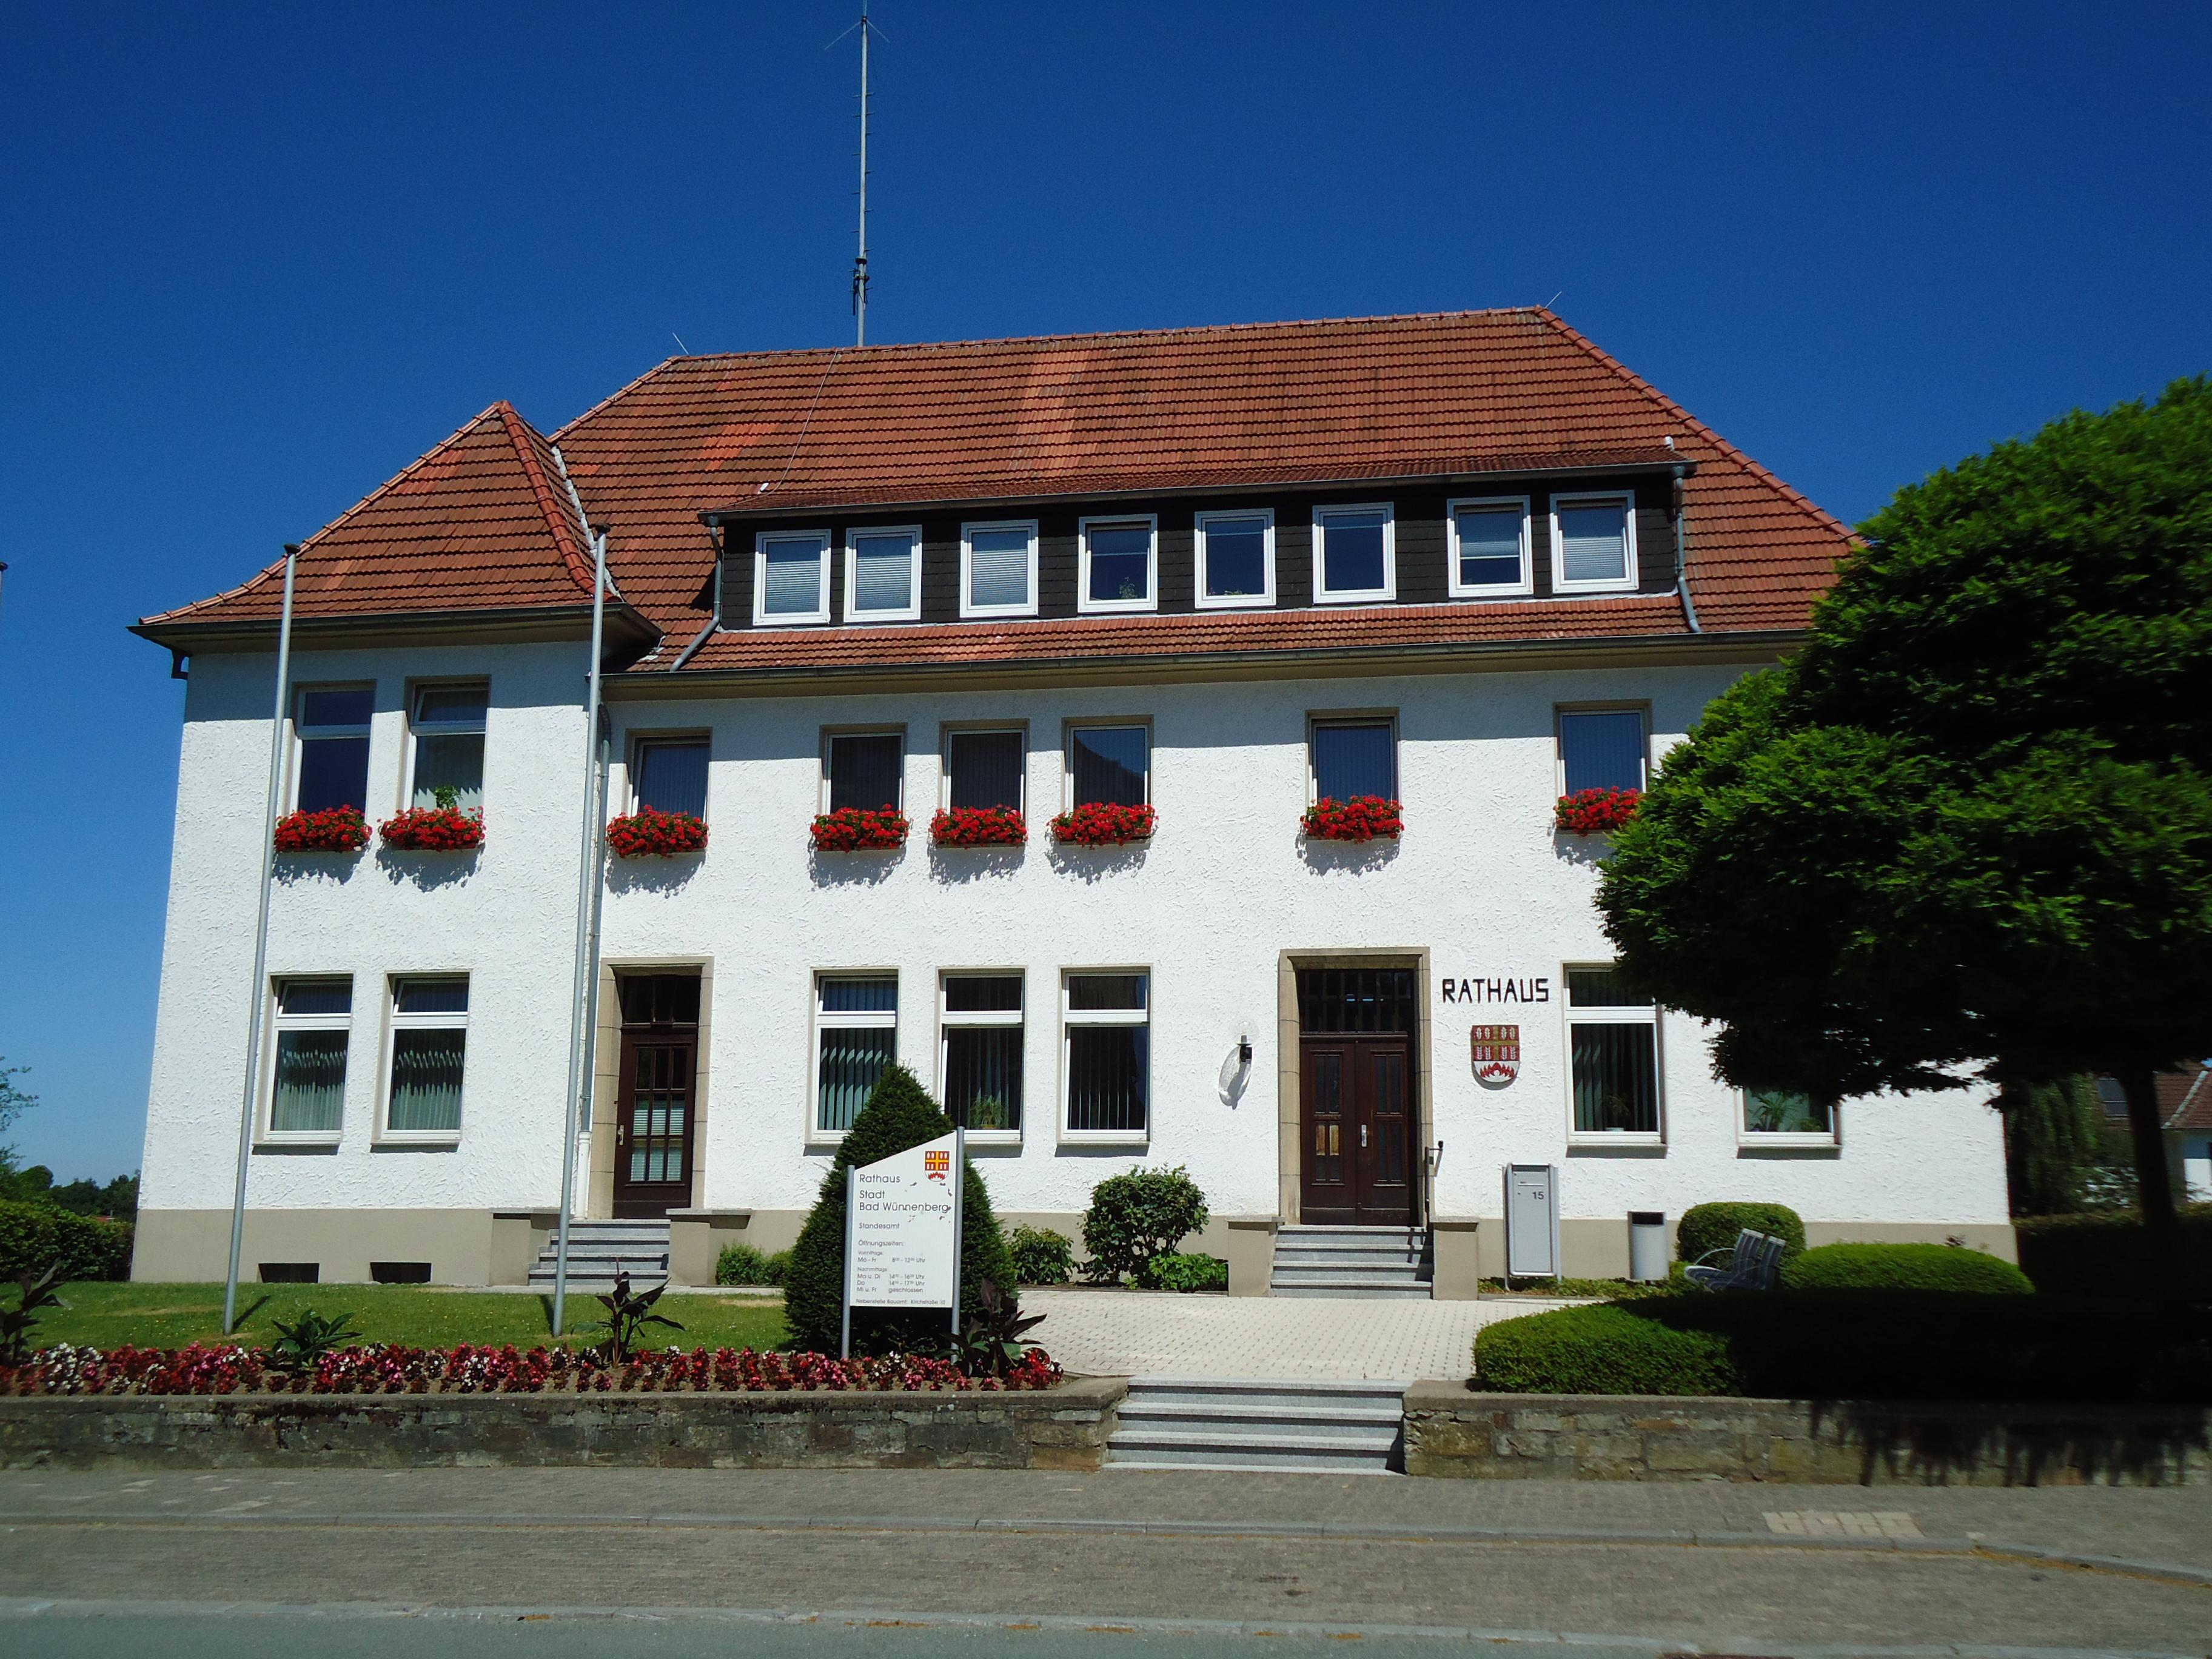 Rathaus Bad Wünnenberg